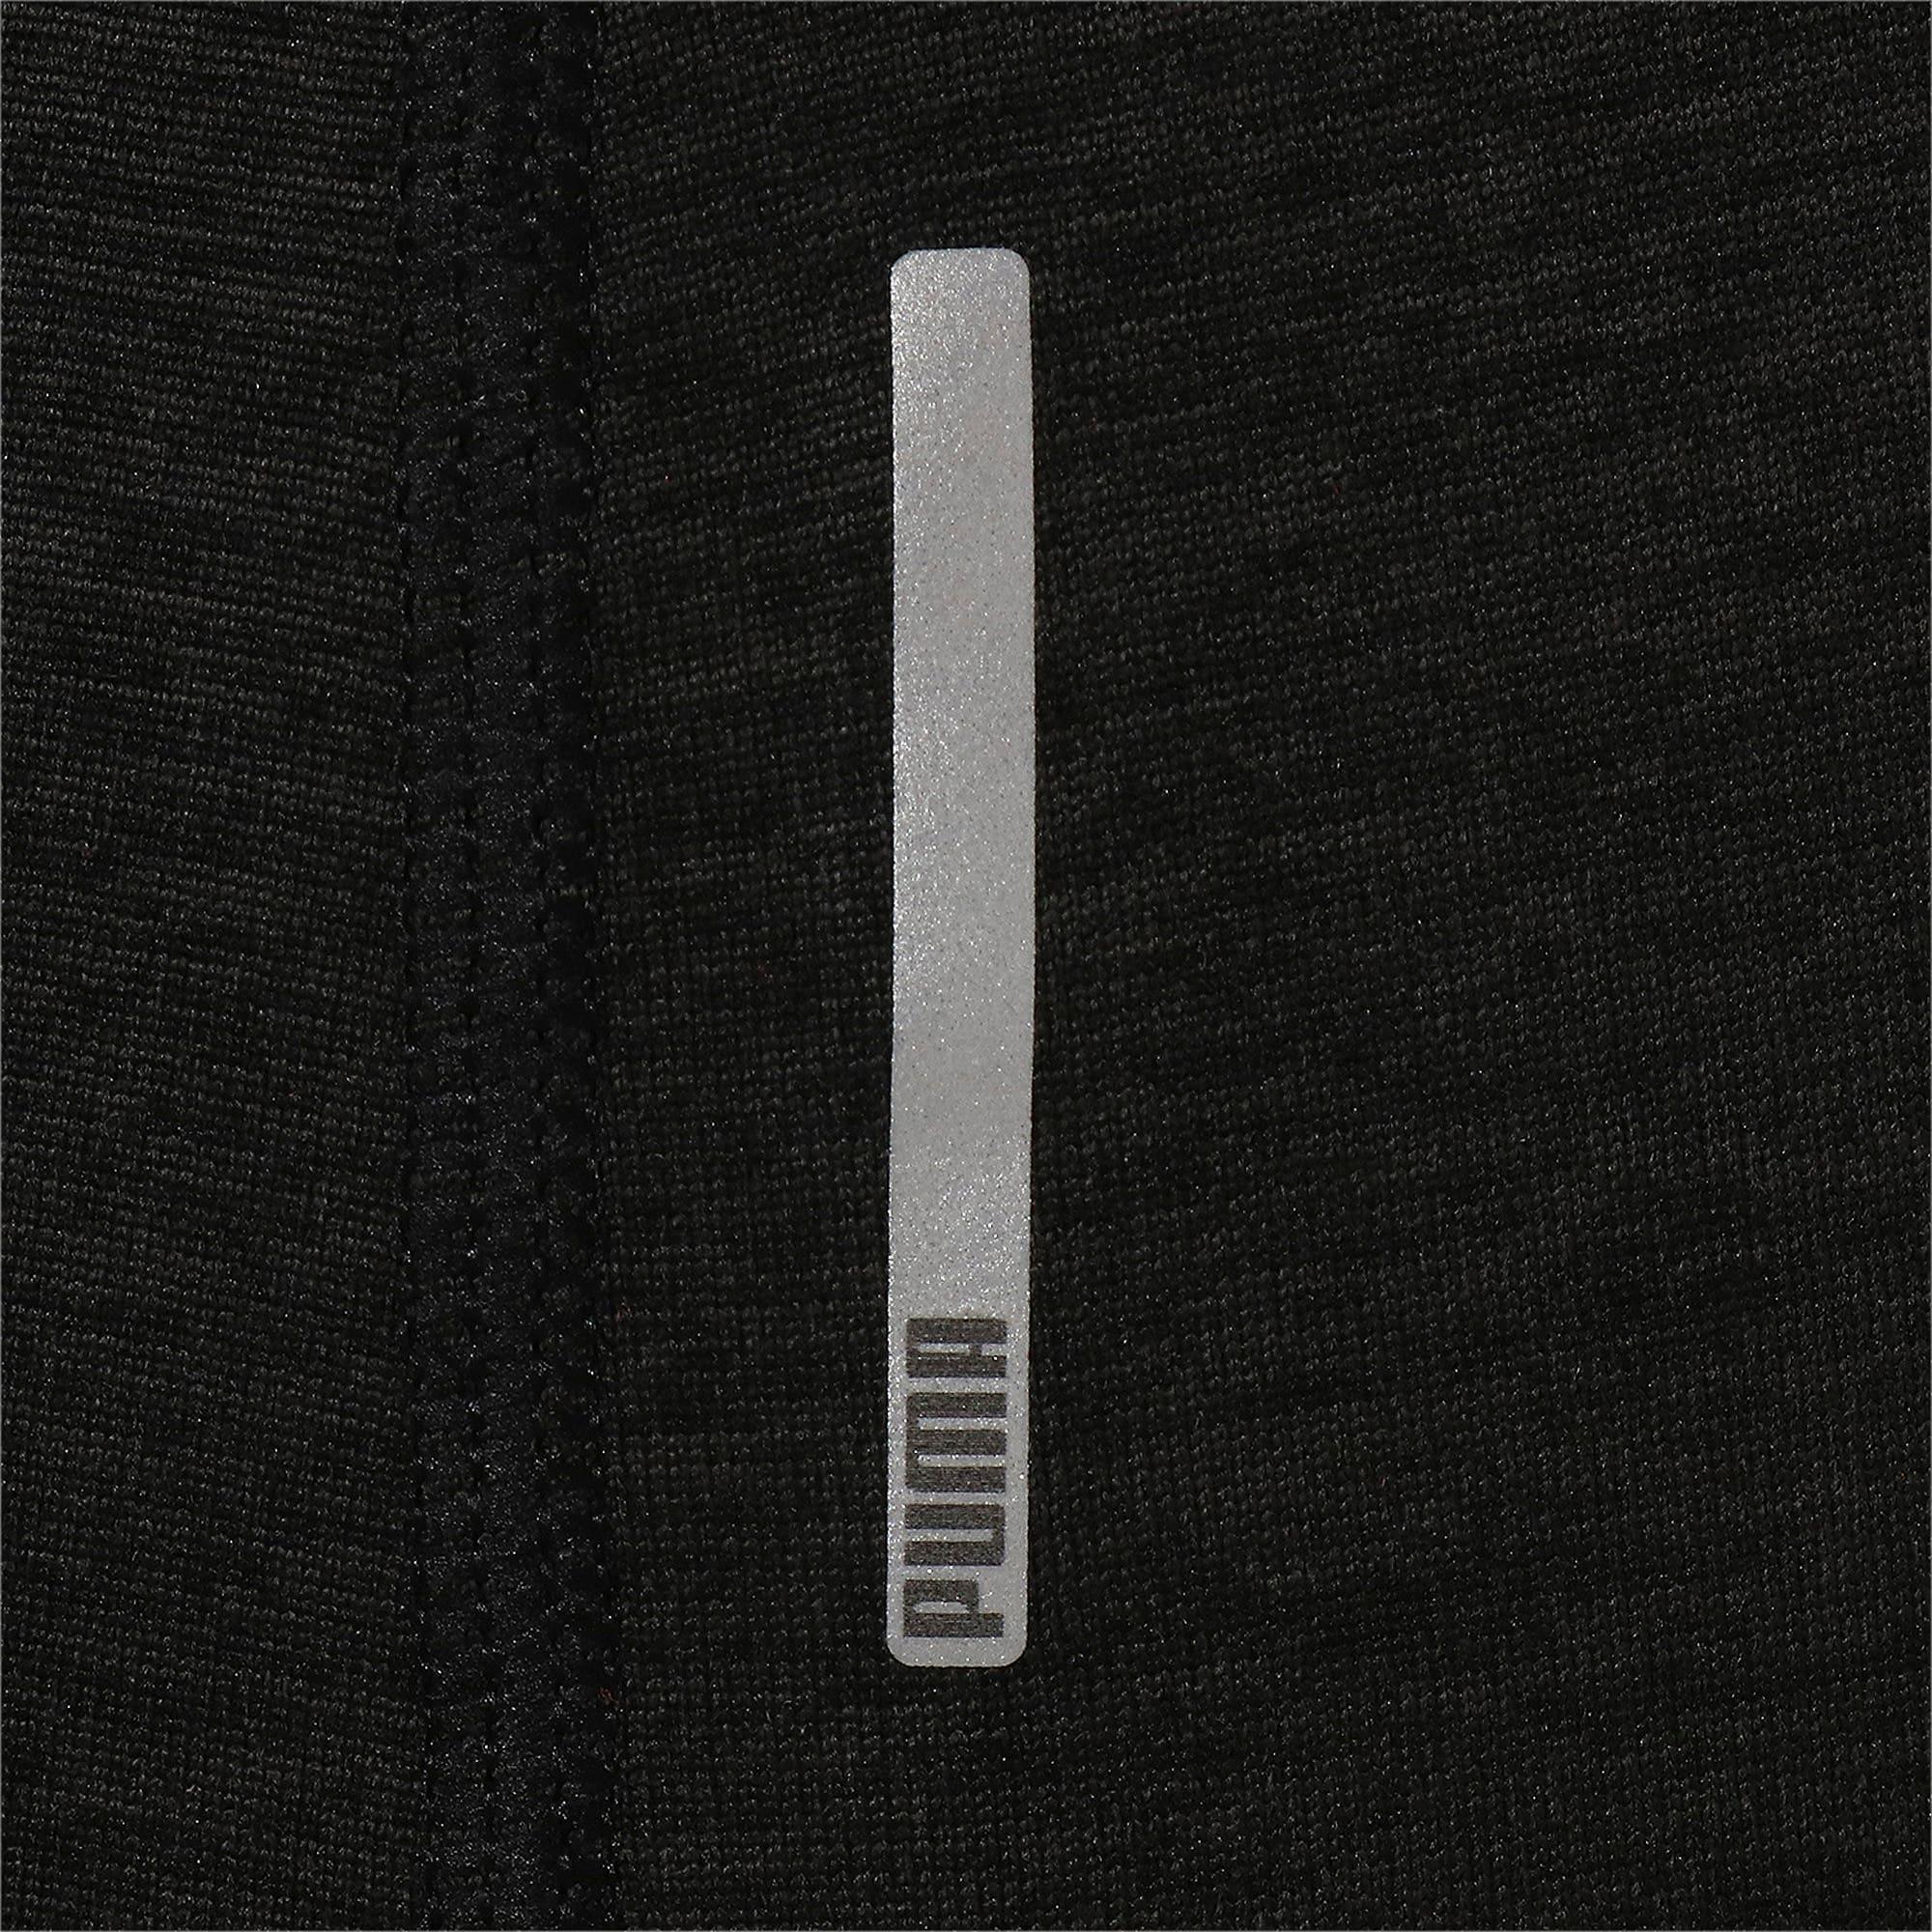 Thumbnail 10 of ヘザー キャット ウィメンズ ランニング Tシャツ 半袖, Puma Black, medium-JPN